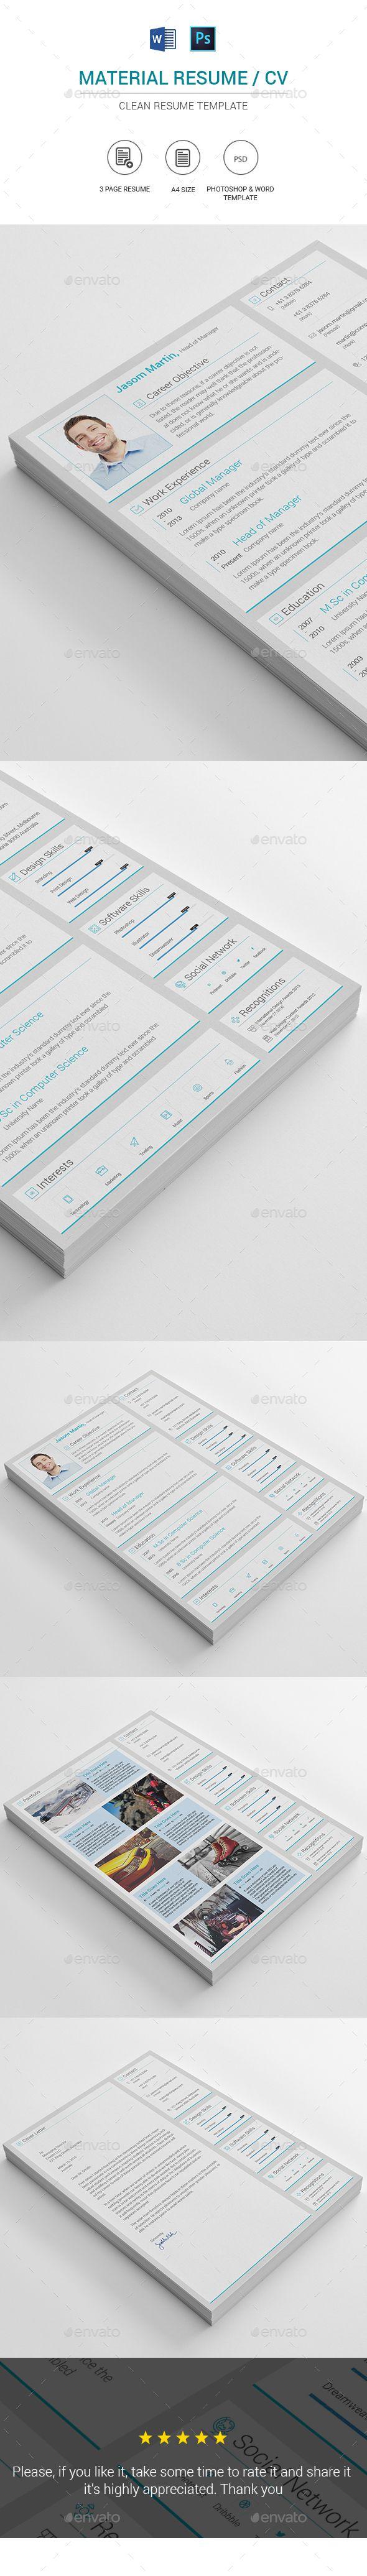 Standard Resume Font Resume  Pinterest  Template Cv Resume Template And Resume Cv